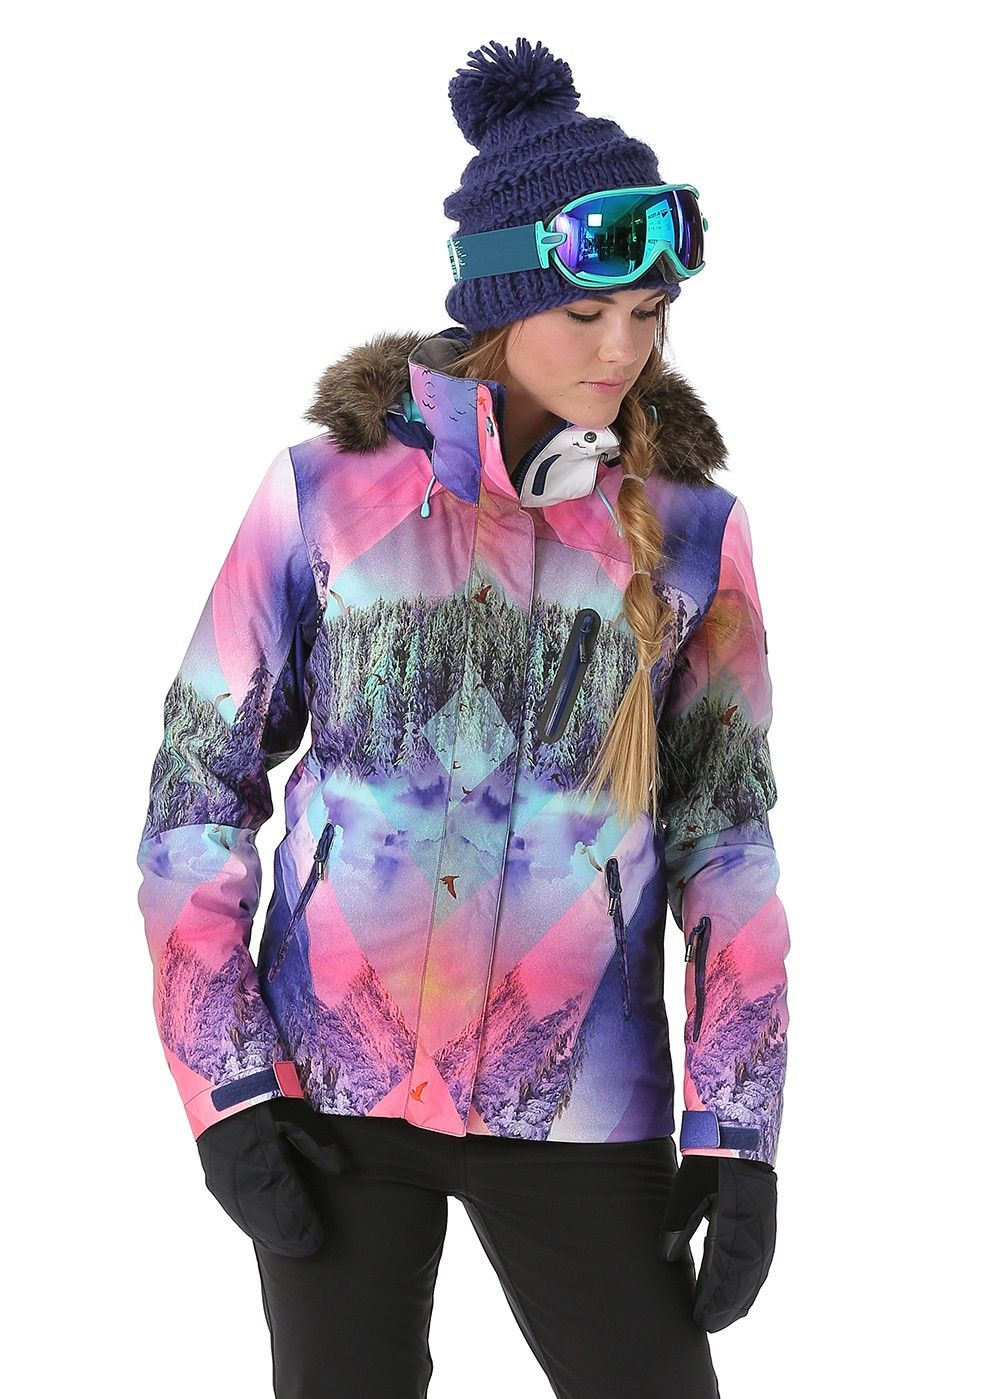 cf3c0580a4 Roxy Women's Jet Ski Premium Jacket in 2019 | Winter Fashion for ...